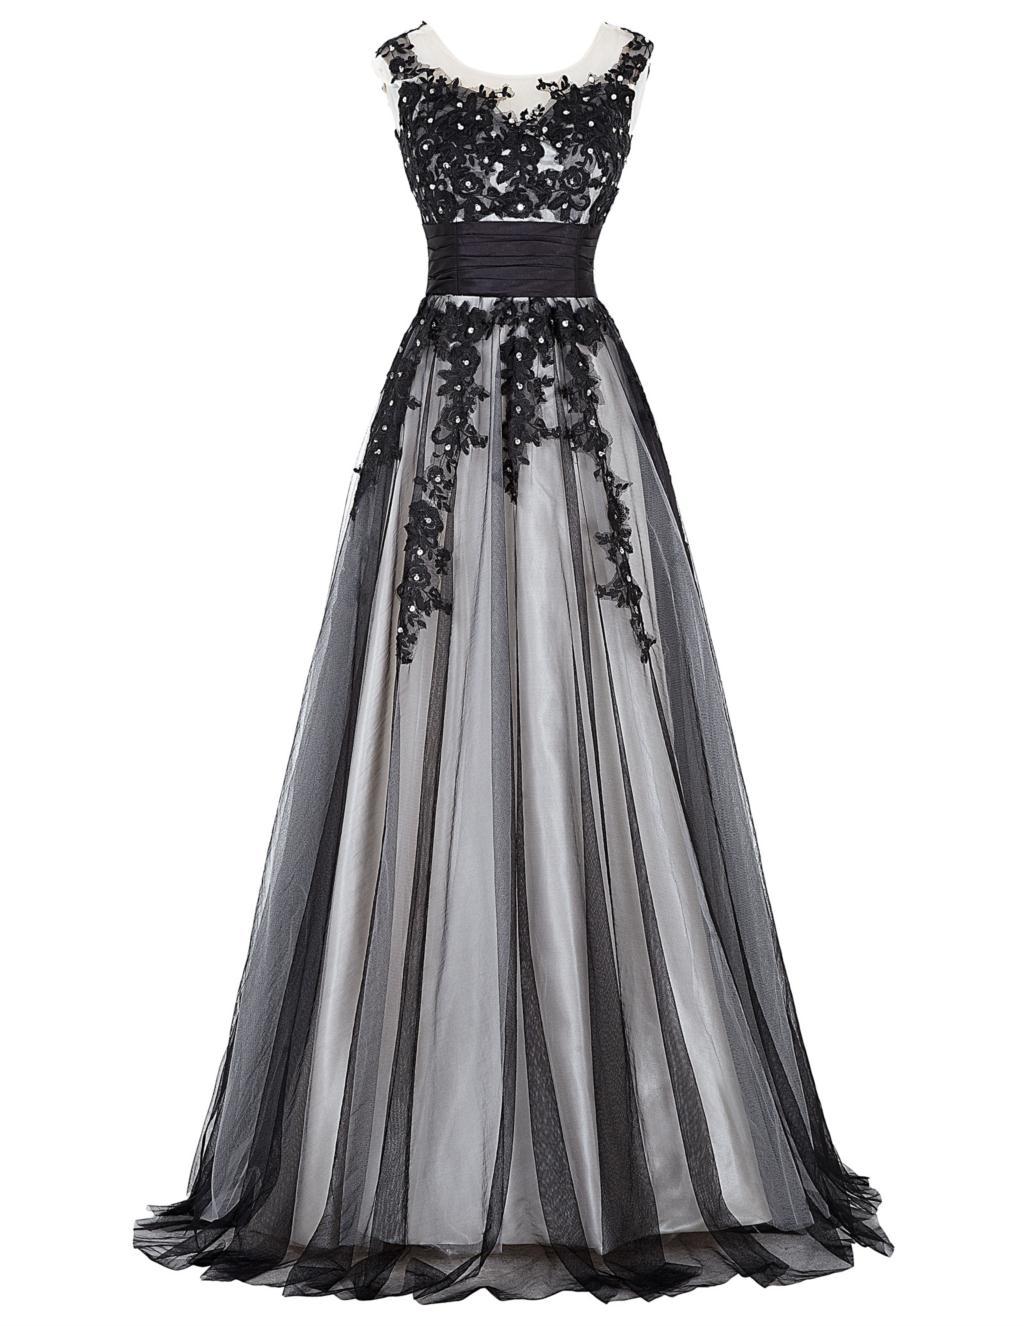 Elegant Lace Appliques Mother of the Bride Dress 13